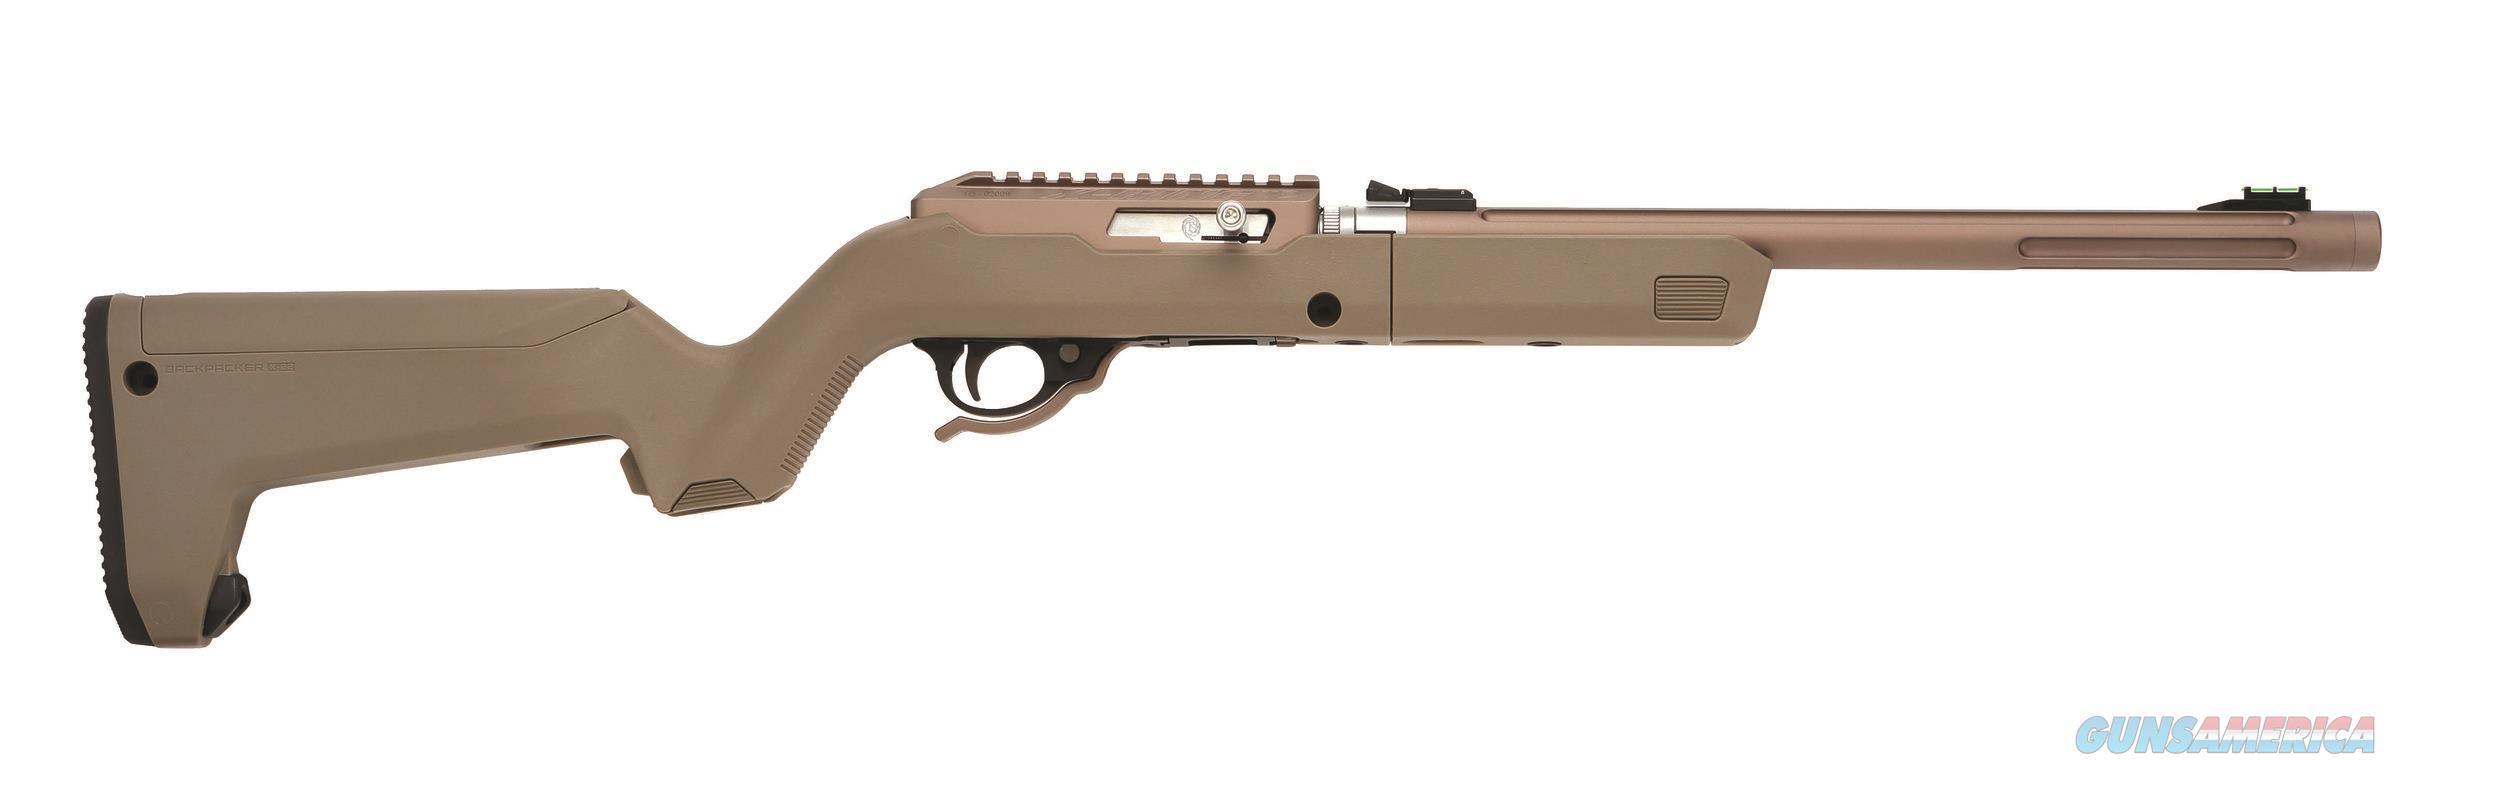 "Tactical Solutions X-Ring TD .22LR 16.5"" QS / FDE Ambi ATD-QS-B-B-FDE  Guns > Rifles > Ruger Rifles > 10-22"